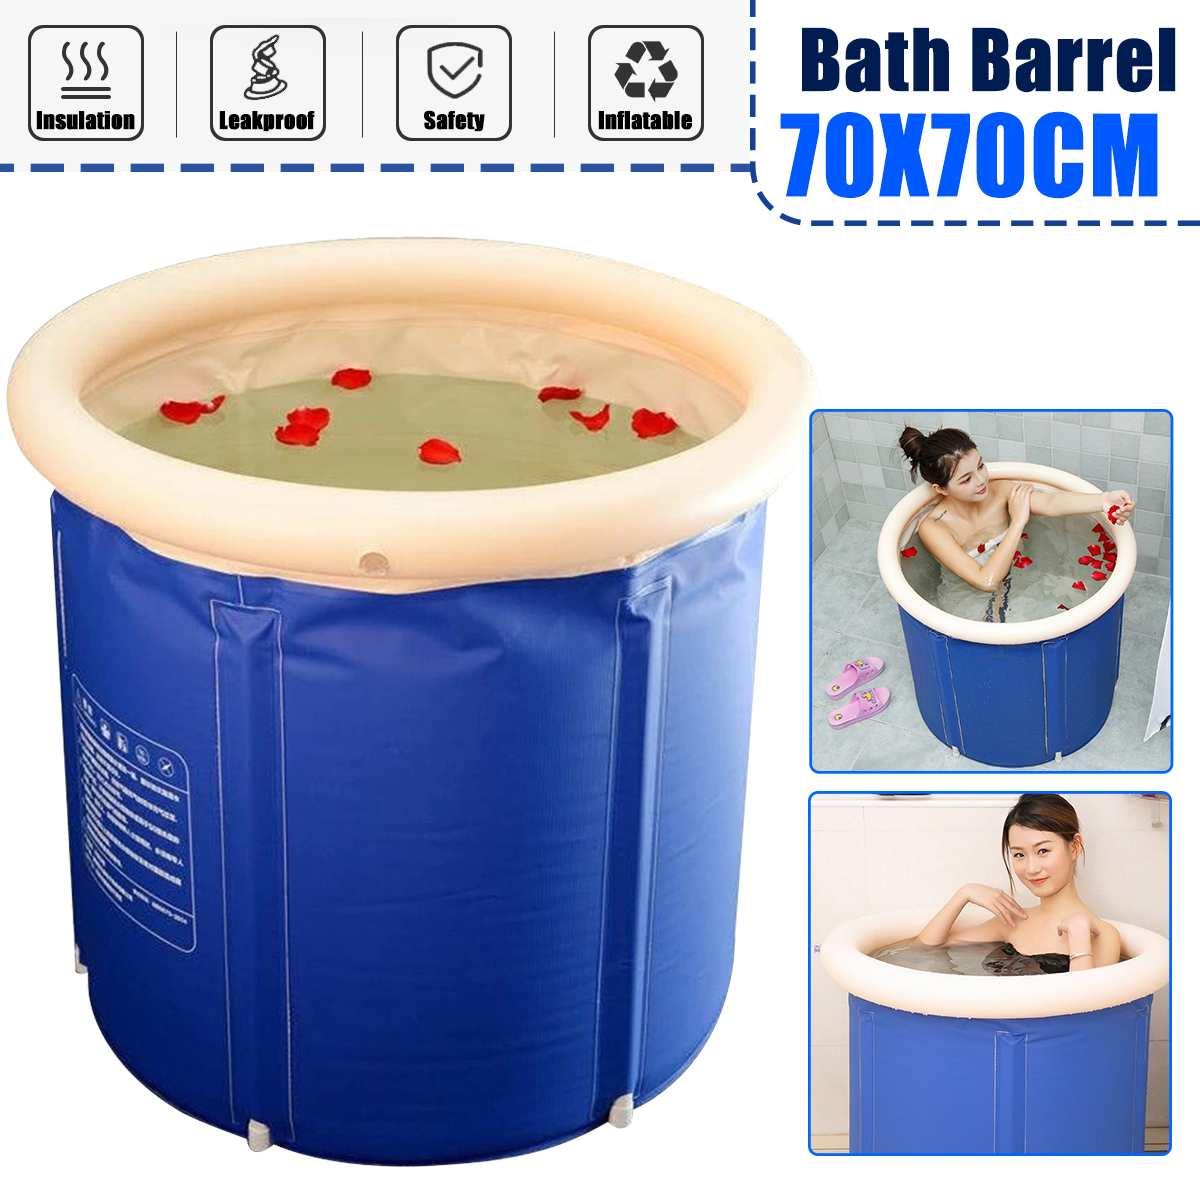 70x70cm Folding Bathtub Home Large Adult Bath Barrel Thickening Children Folding Bucket Inflatable Small Apartment